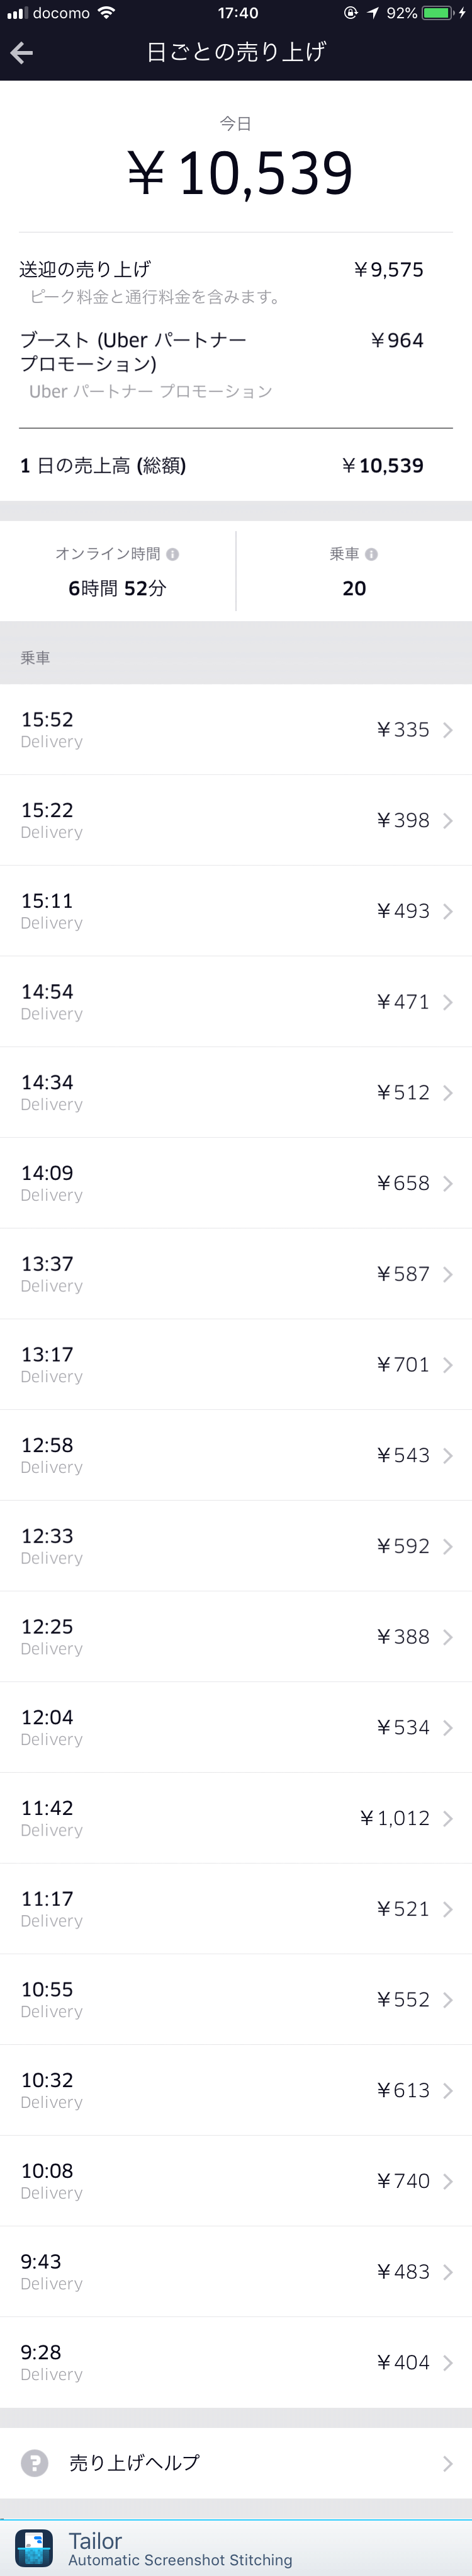 Uber Eats5月13日の配達記録